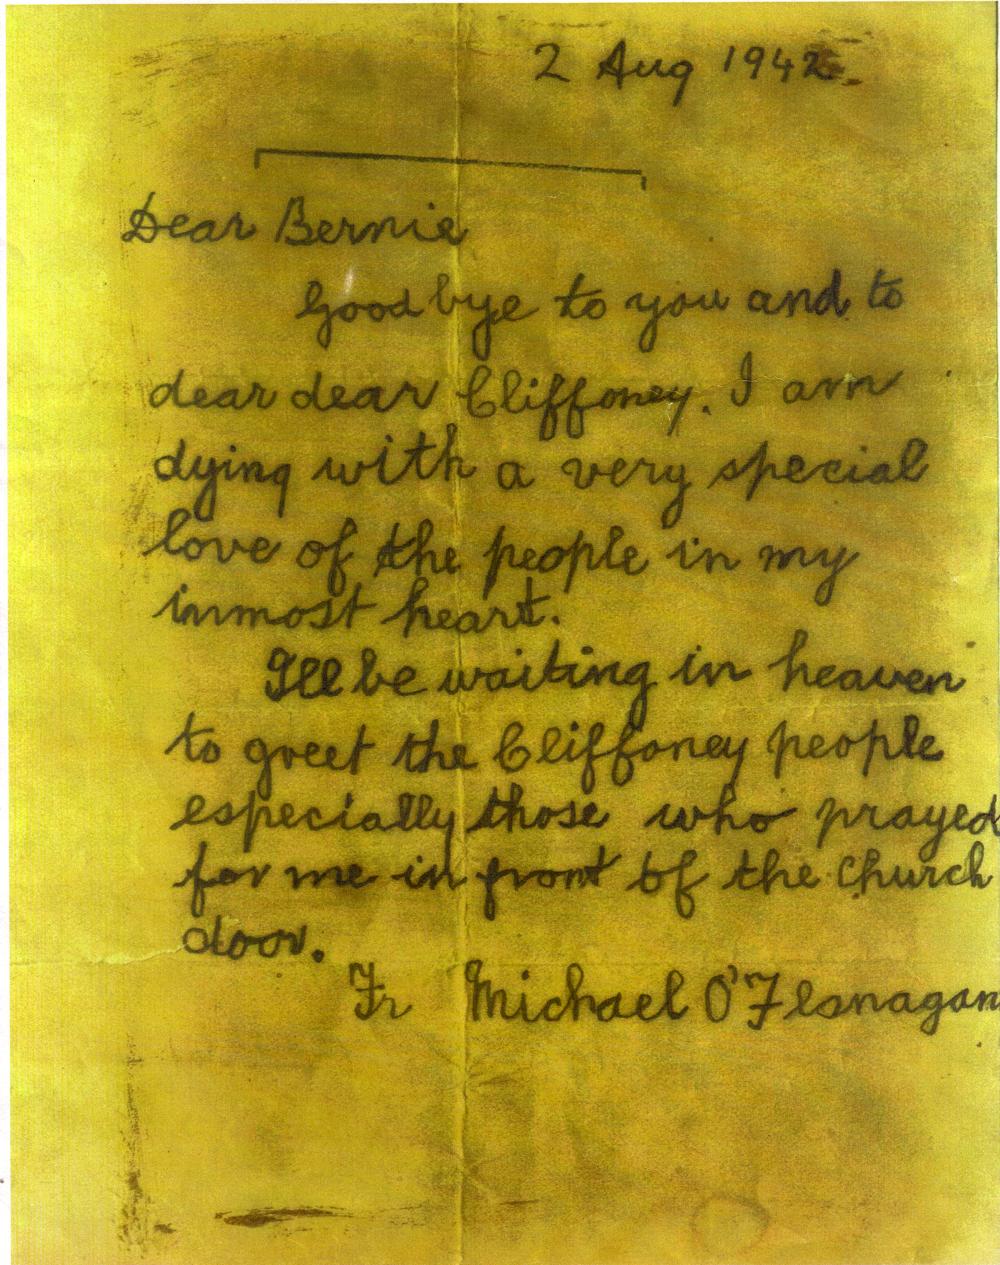 File:Fr  O'Flanagan's Last letter, 2nd August 1942 jpg